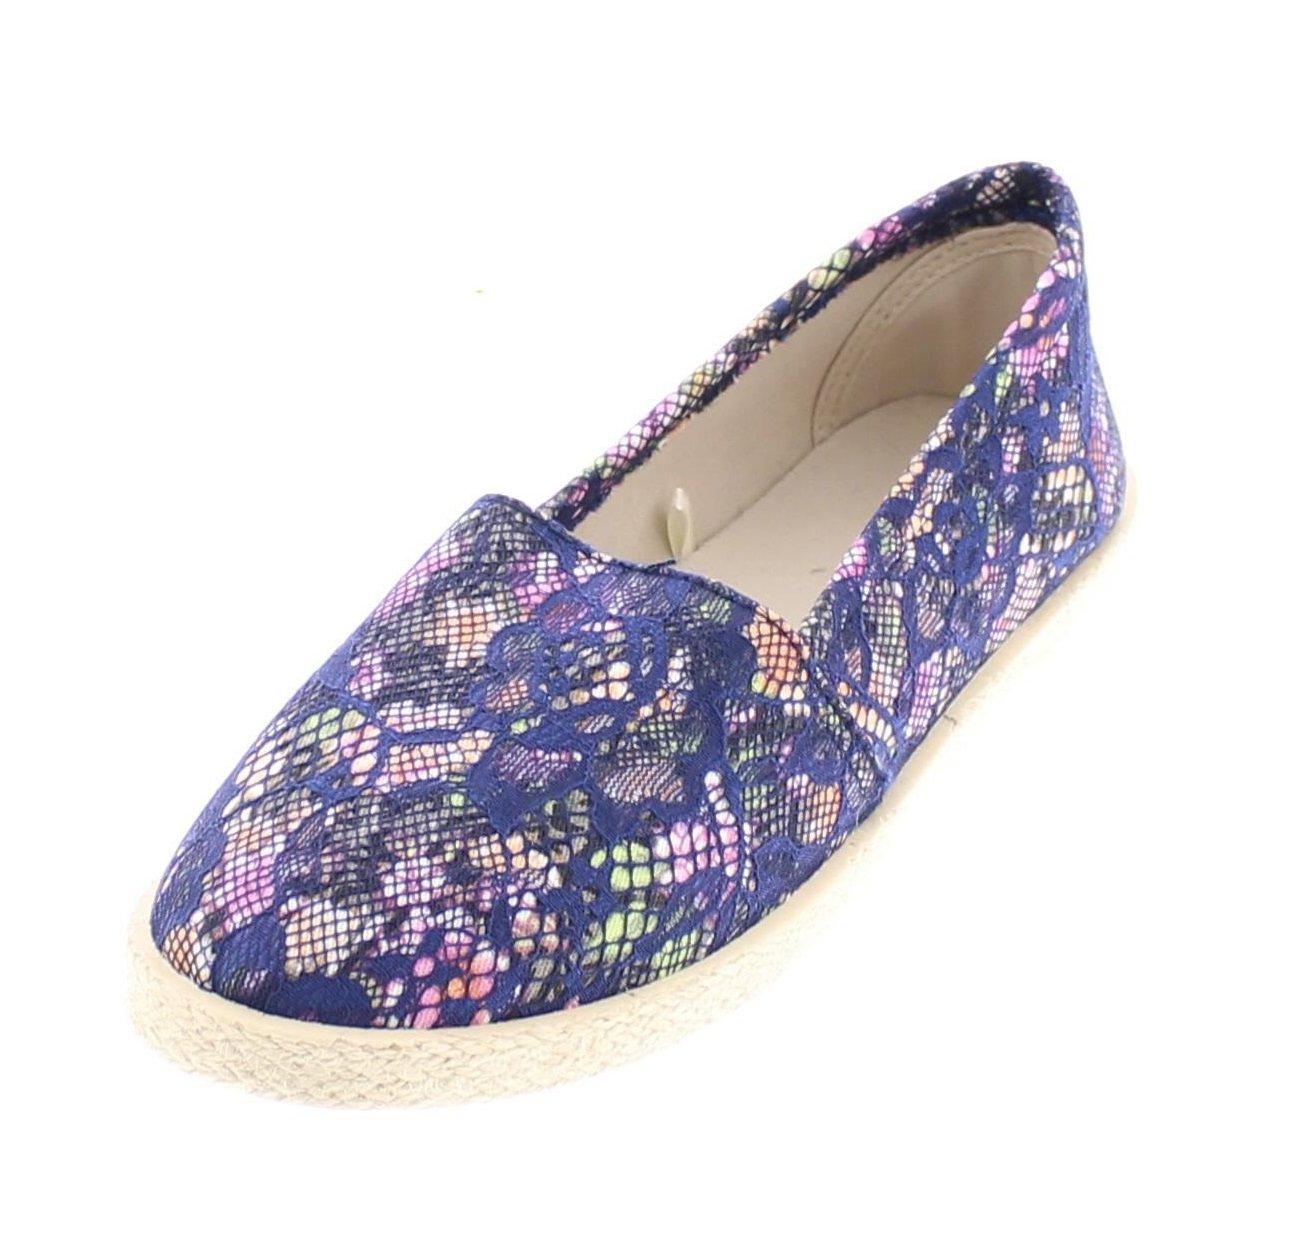 Gold Toe Women's Delphie Canvas Alpargatas Espadrille Flat Casual Summer Style Comfy Slip On Walking Shoe B077RHK4PF 8 B(M) US|Floral